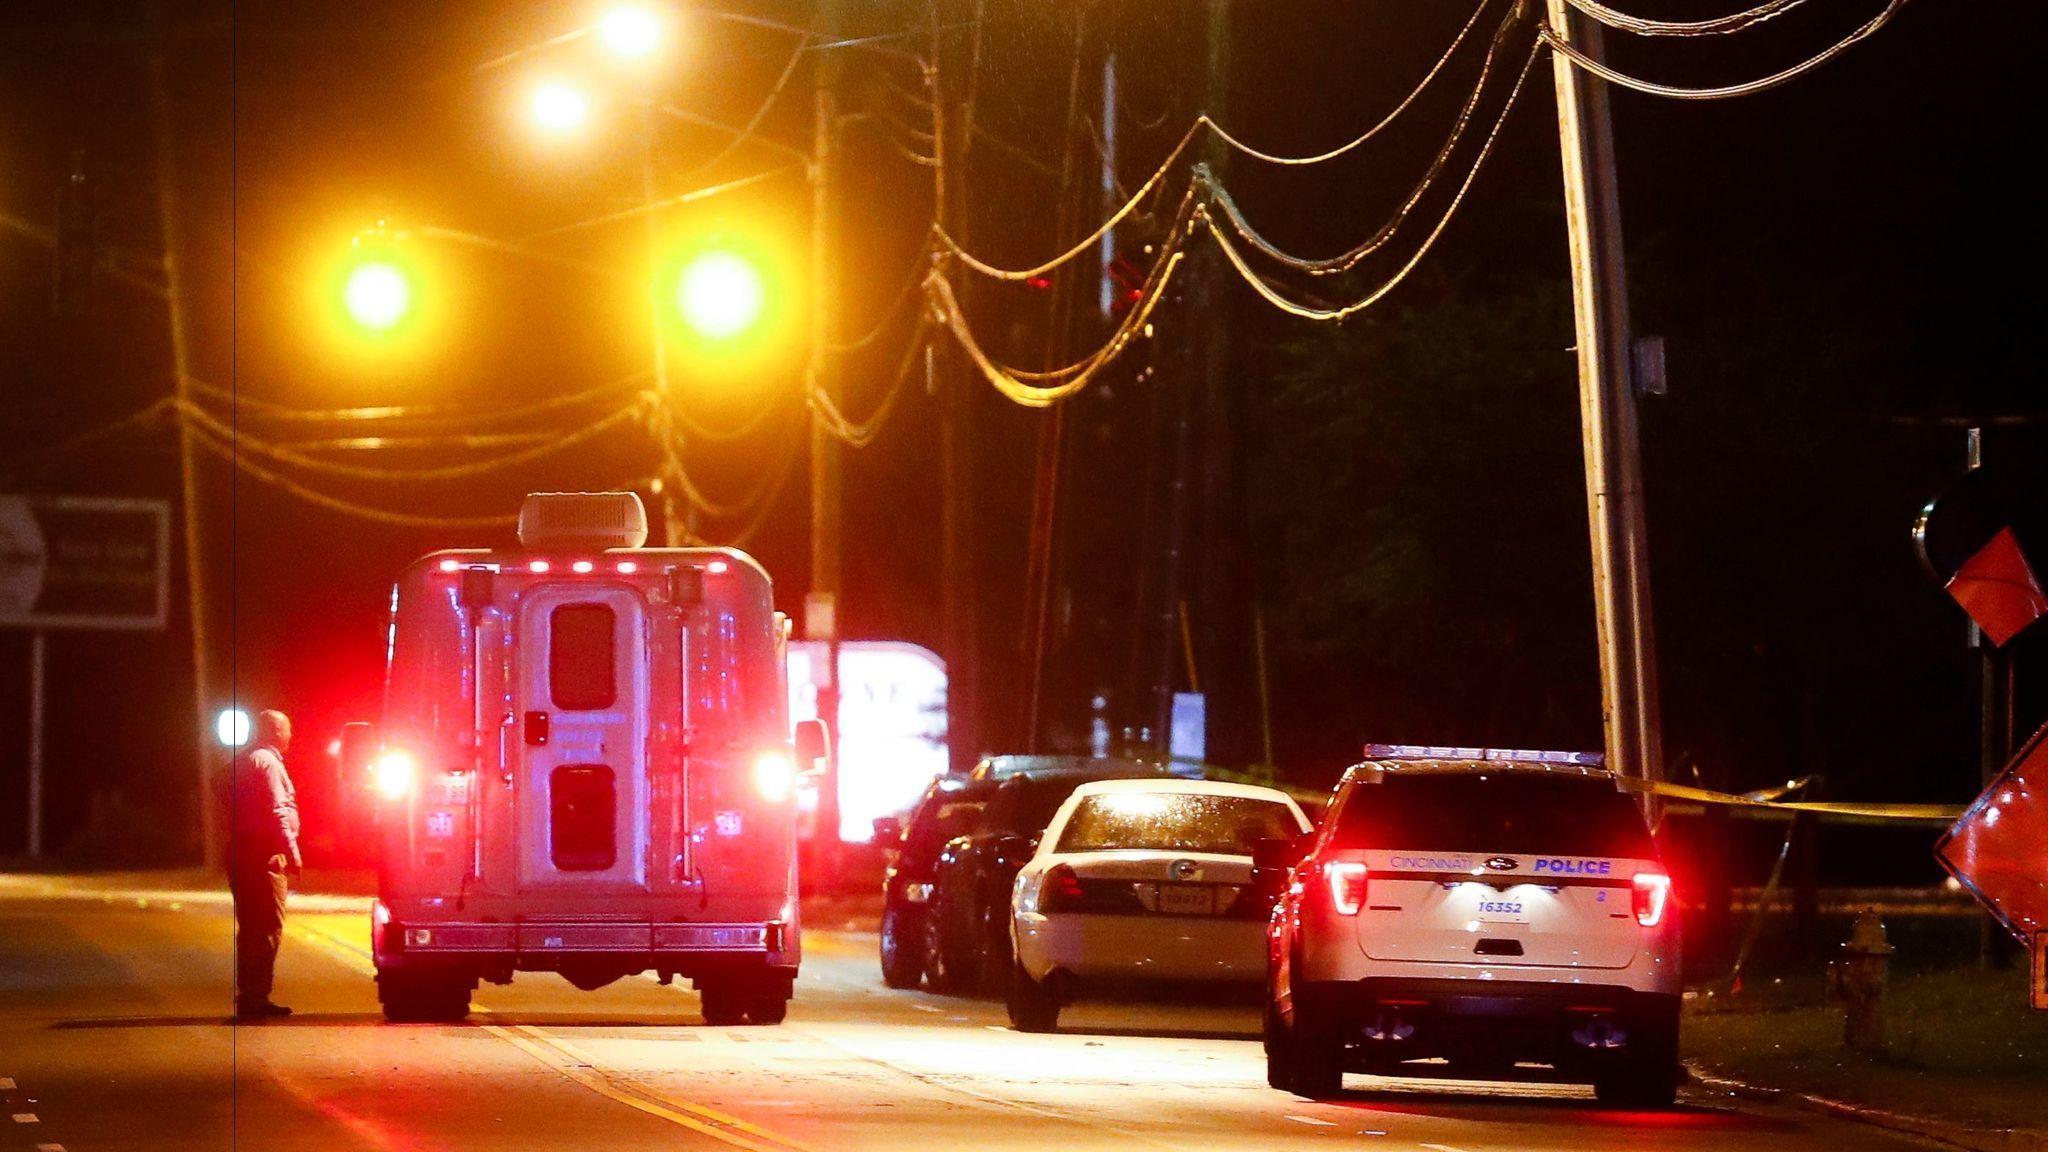 15 people shot, 1 killed, at Cincinnati nightclub